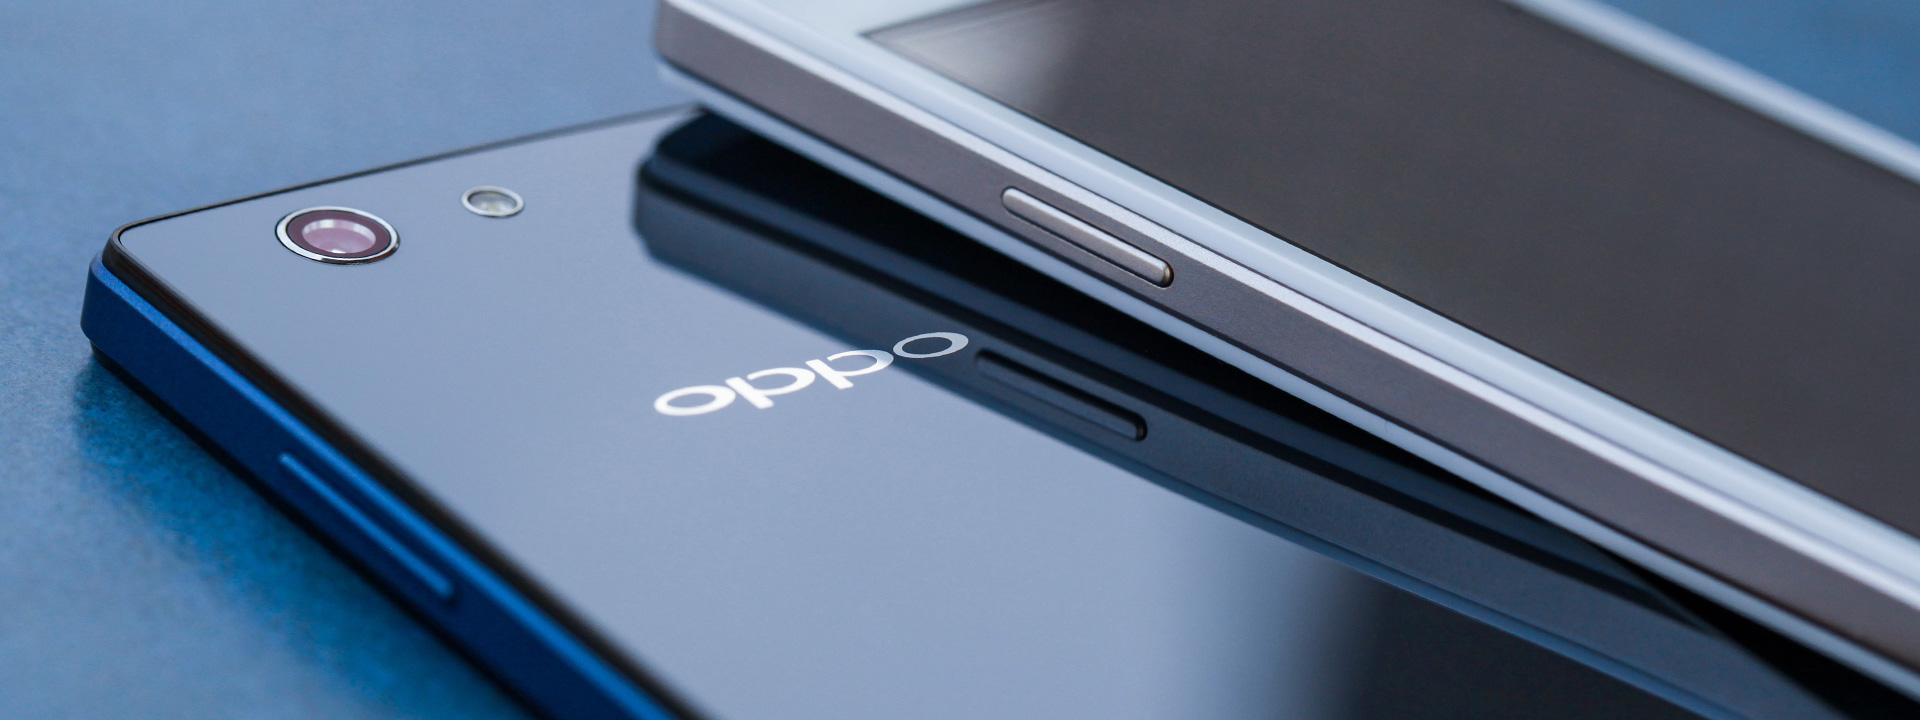 OPPO NEO 5S recension